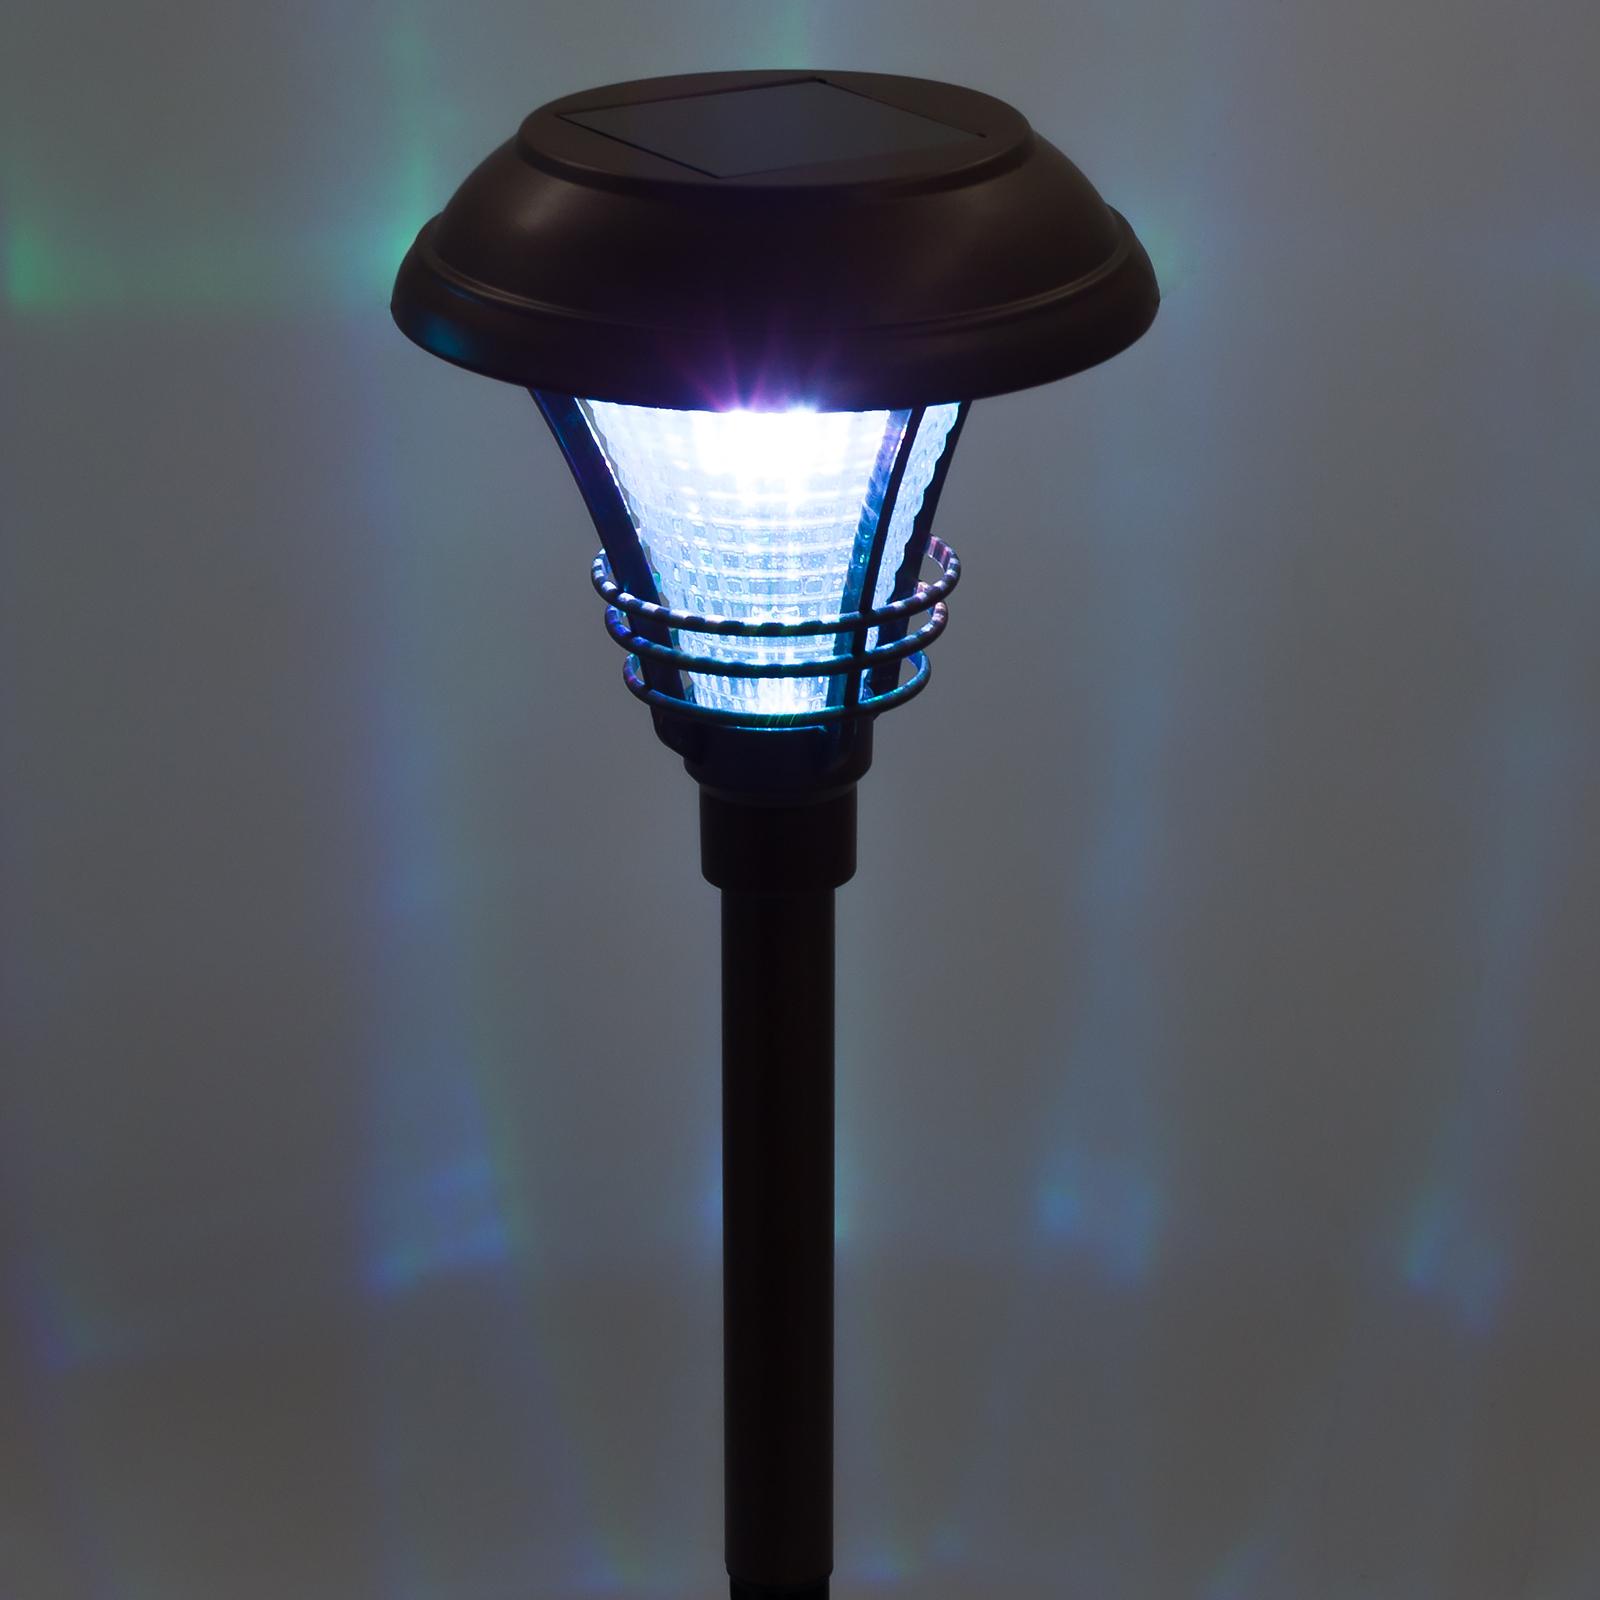 Outdoor Led Antique Solar Landscape Garden Path Light Lamp: WESTINGHOUSE NEW Kenbury Solar Outdoor Garden LED Stake